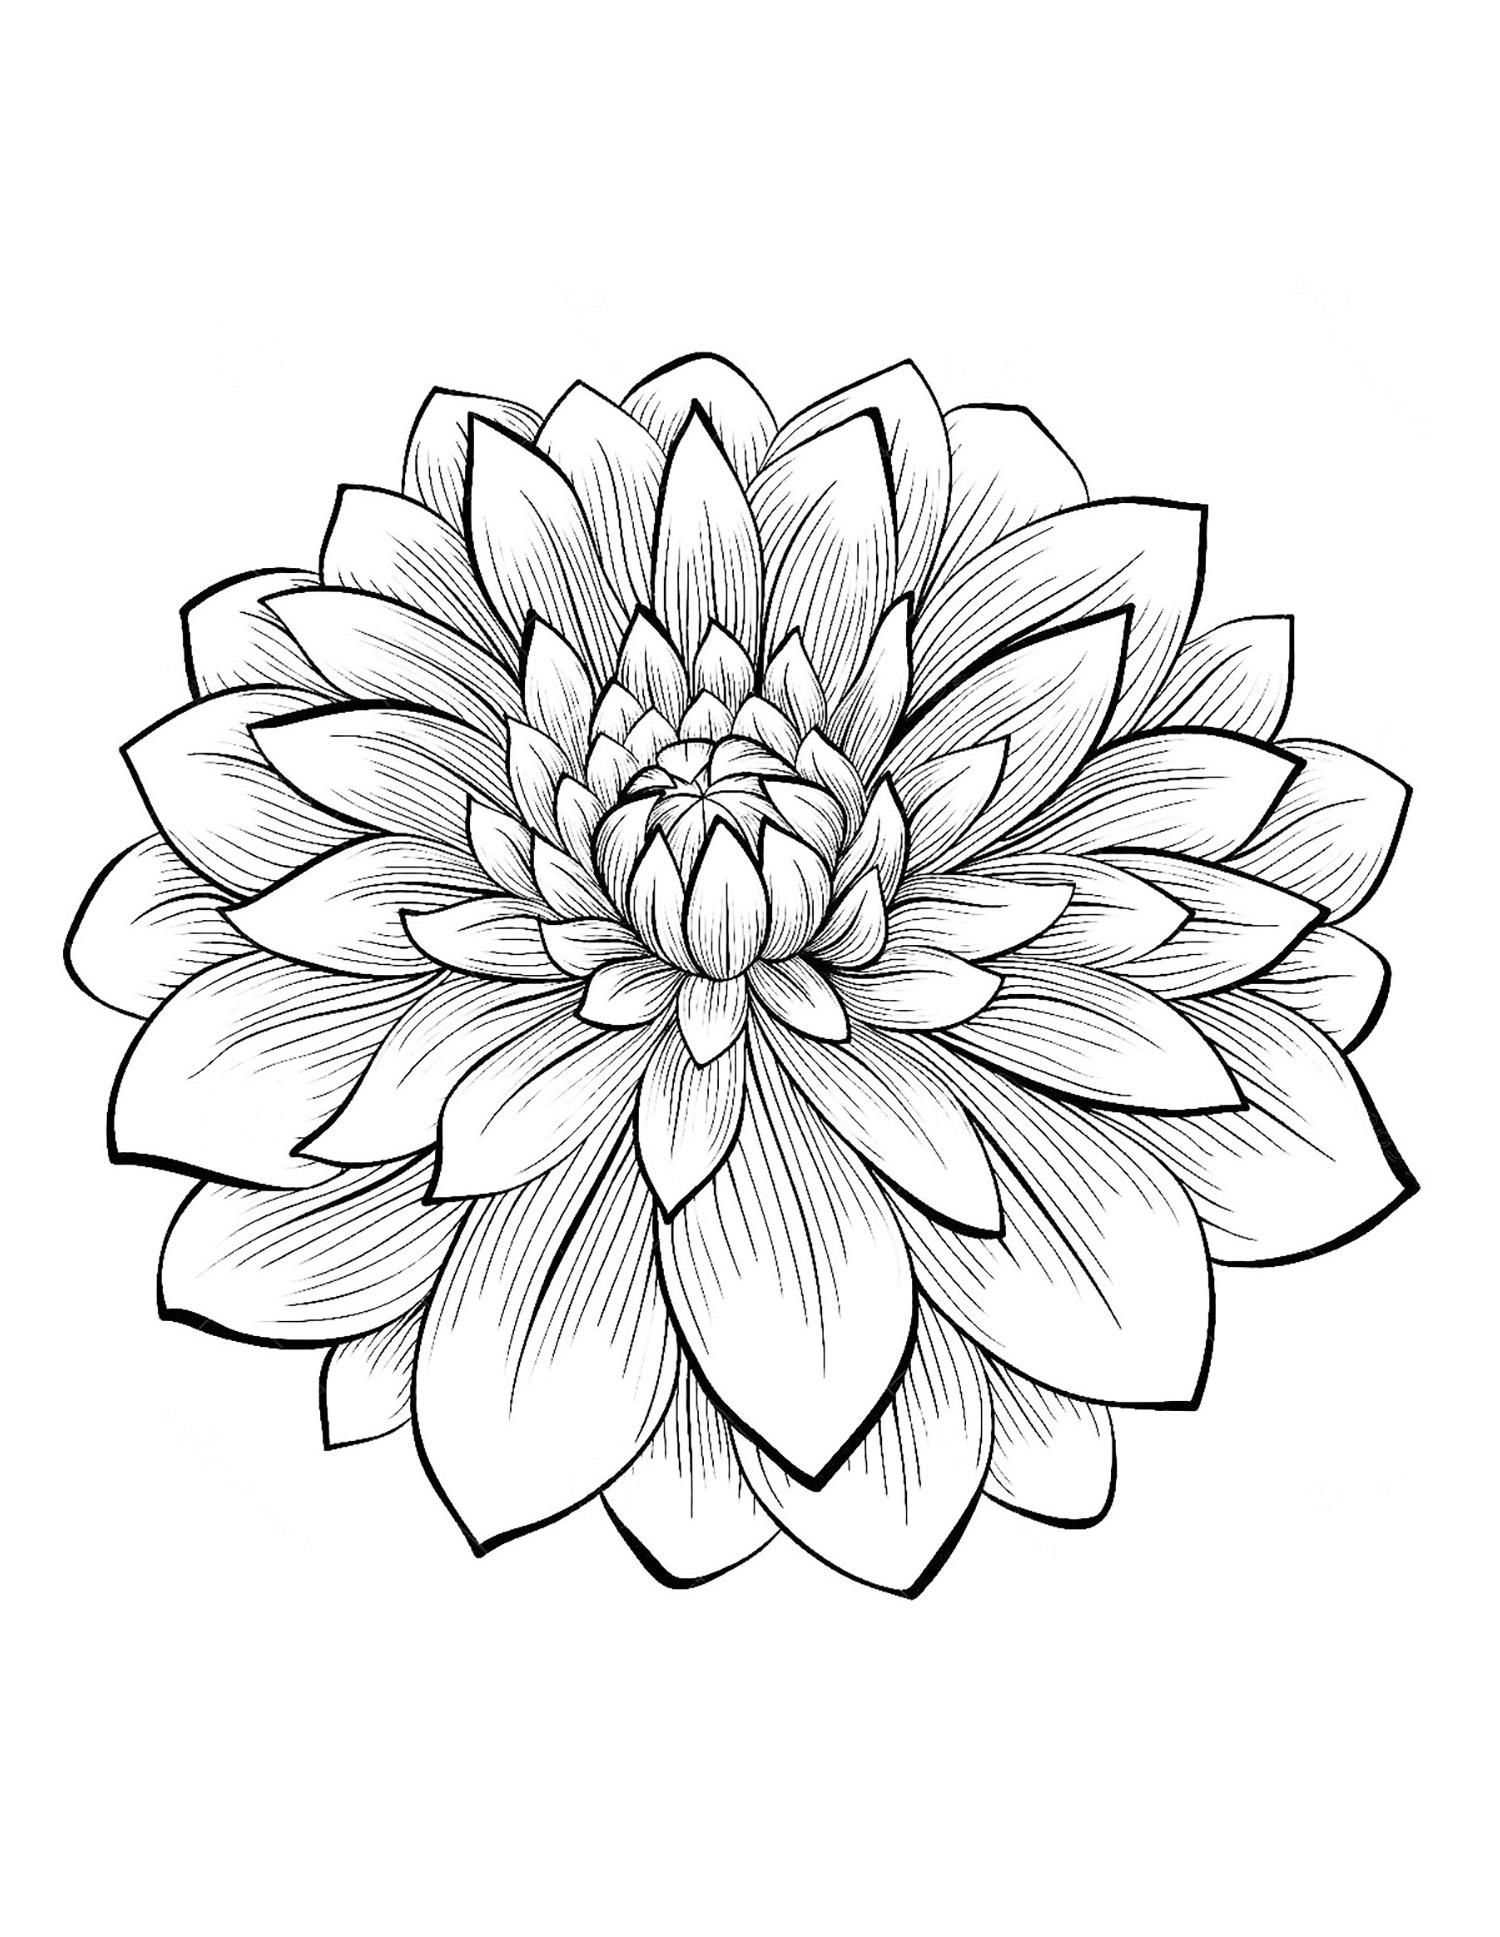 Dahlia coloring #17, Download drawings